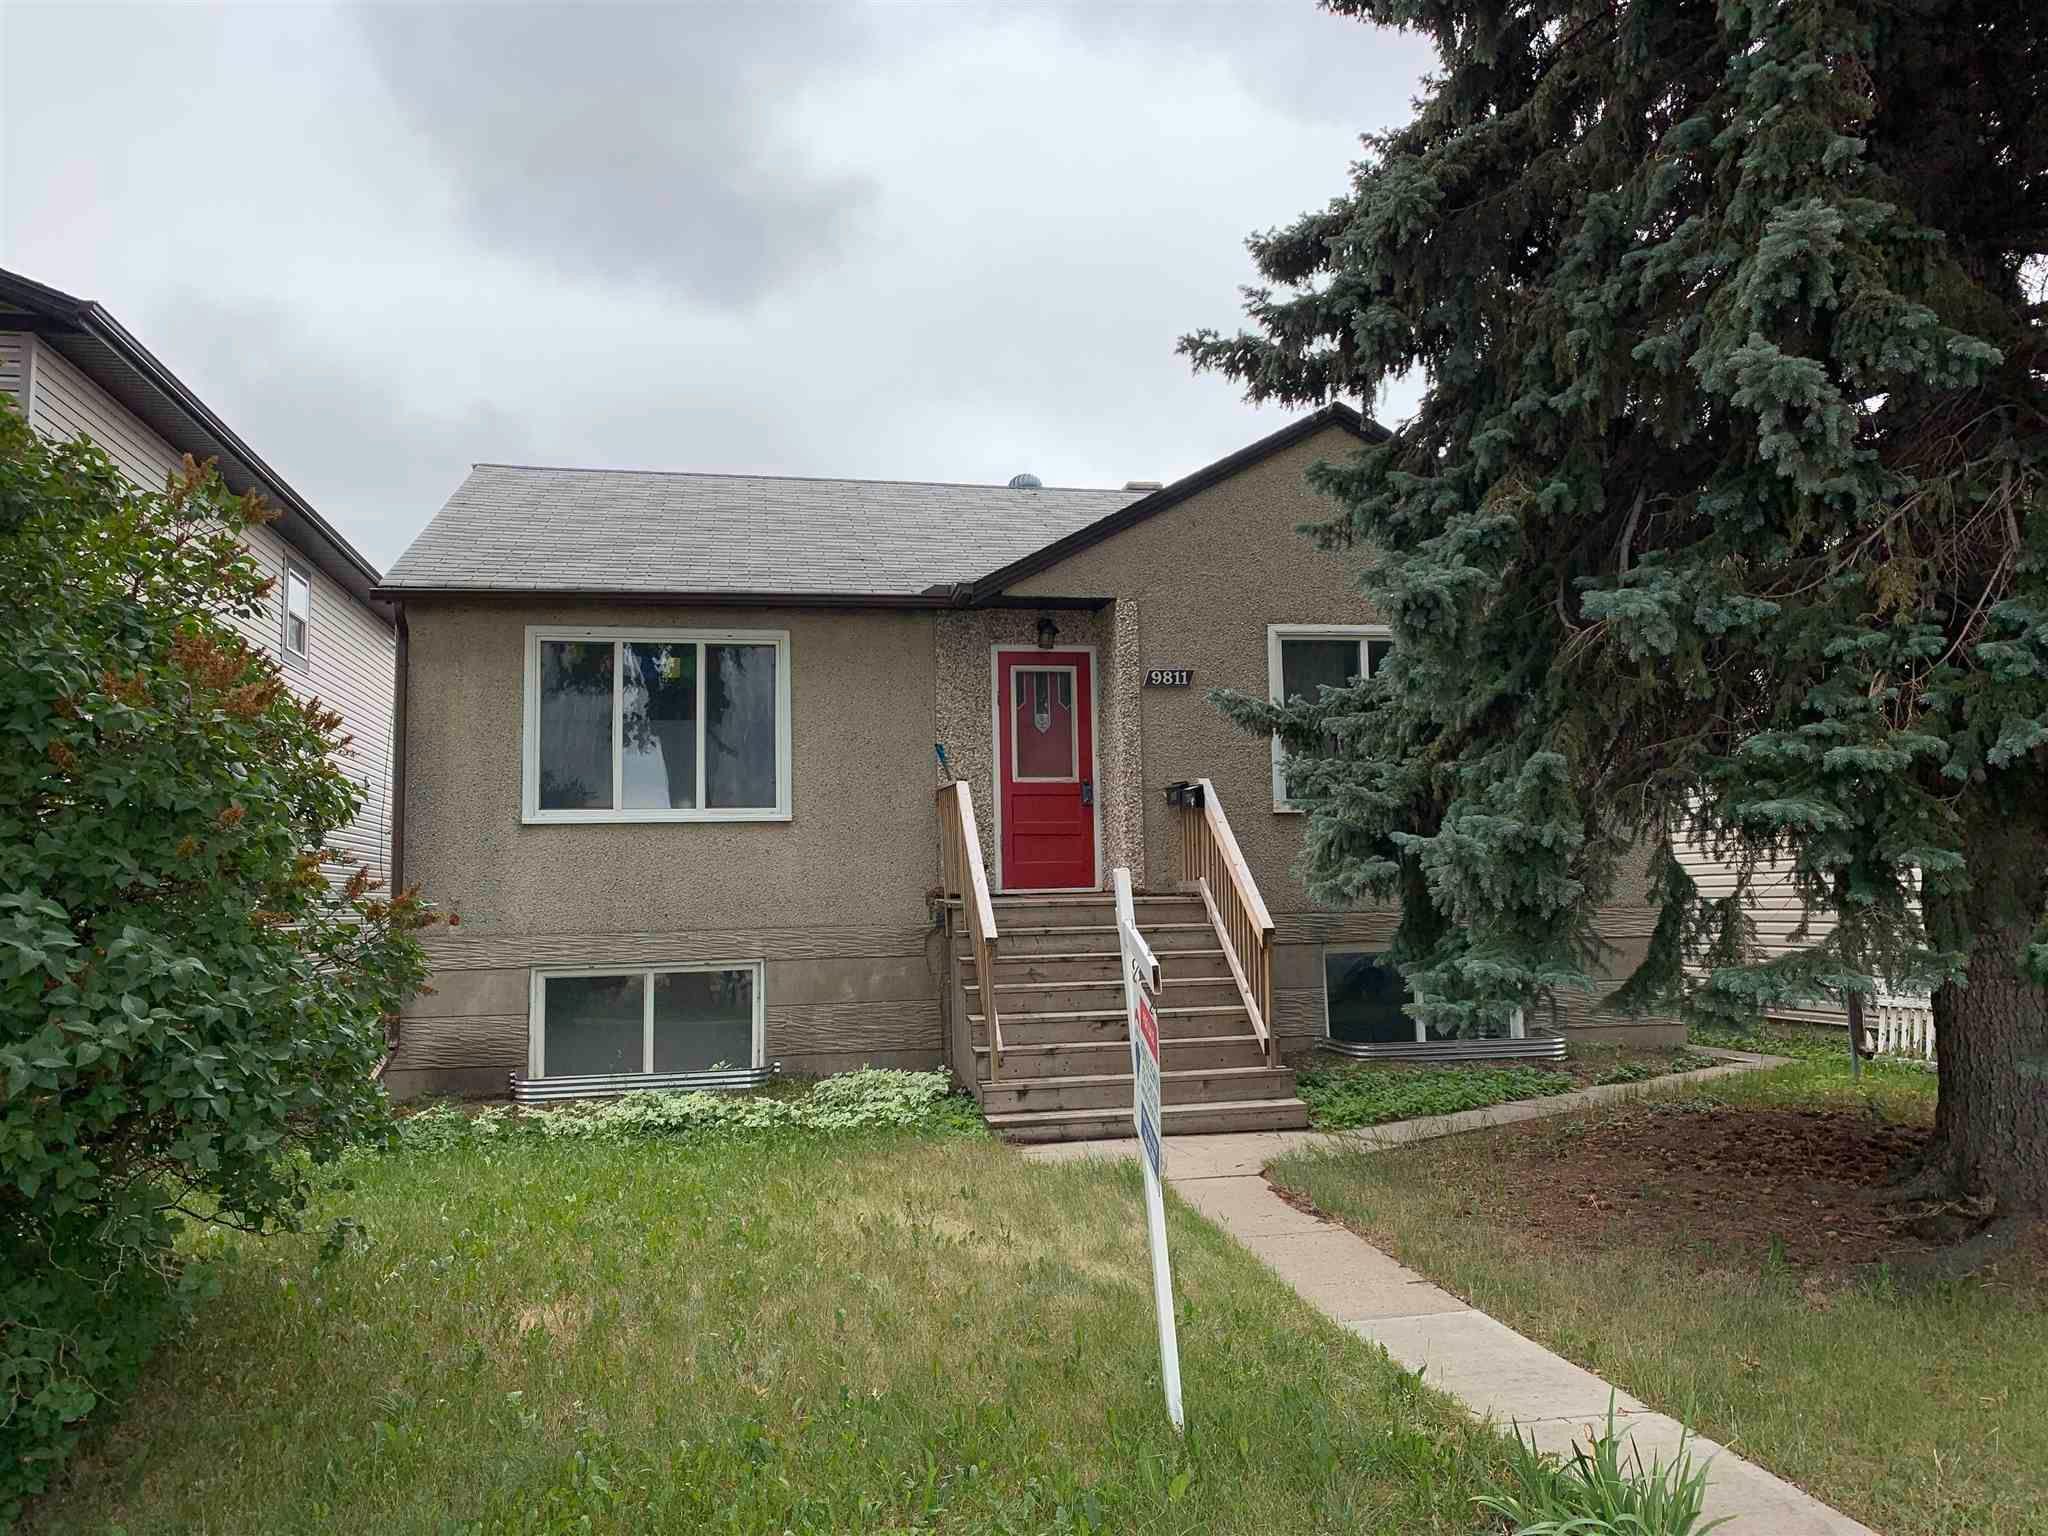 Main Photo: 9811 70 Avenue in Edmonton: Zone 17 House for sale : MLS®# E4253276